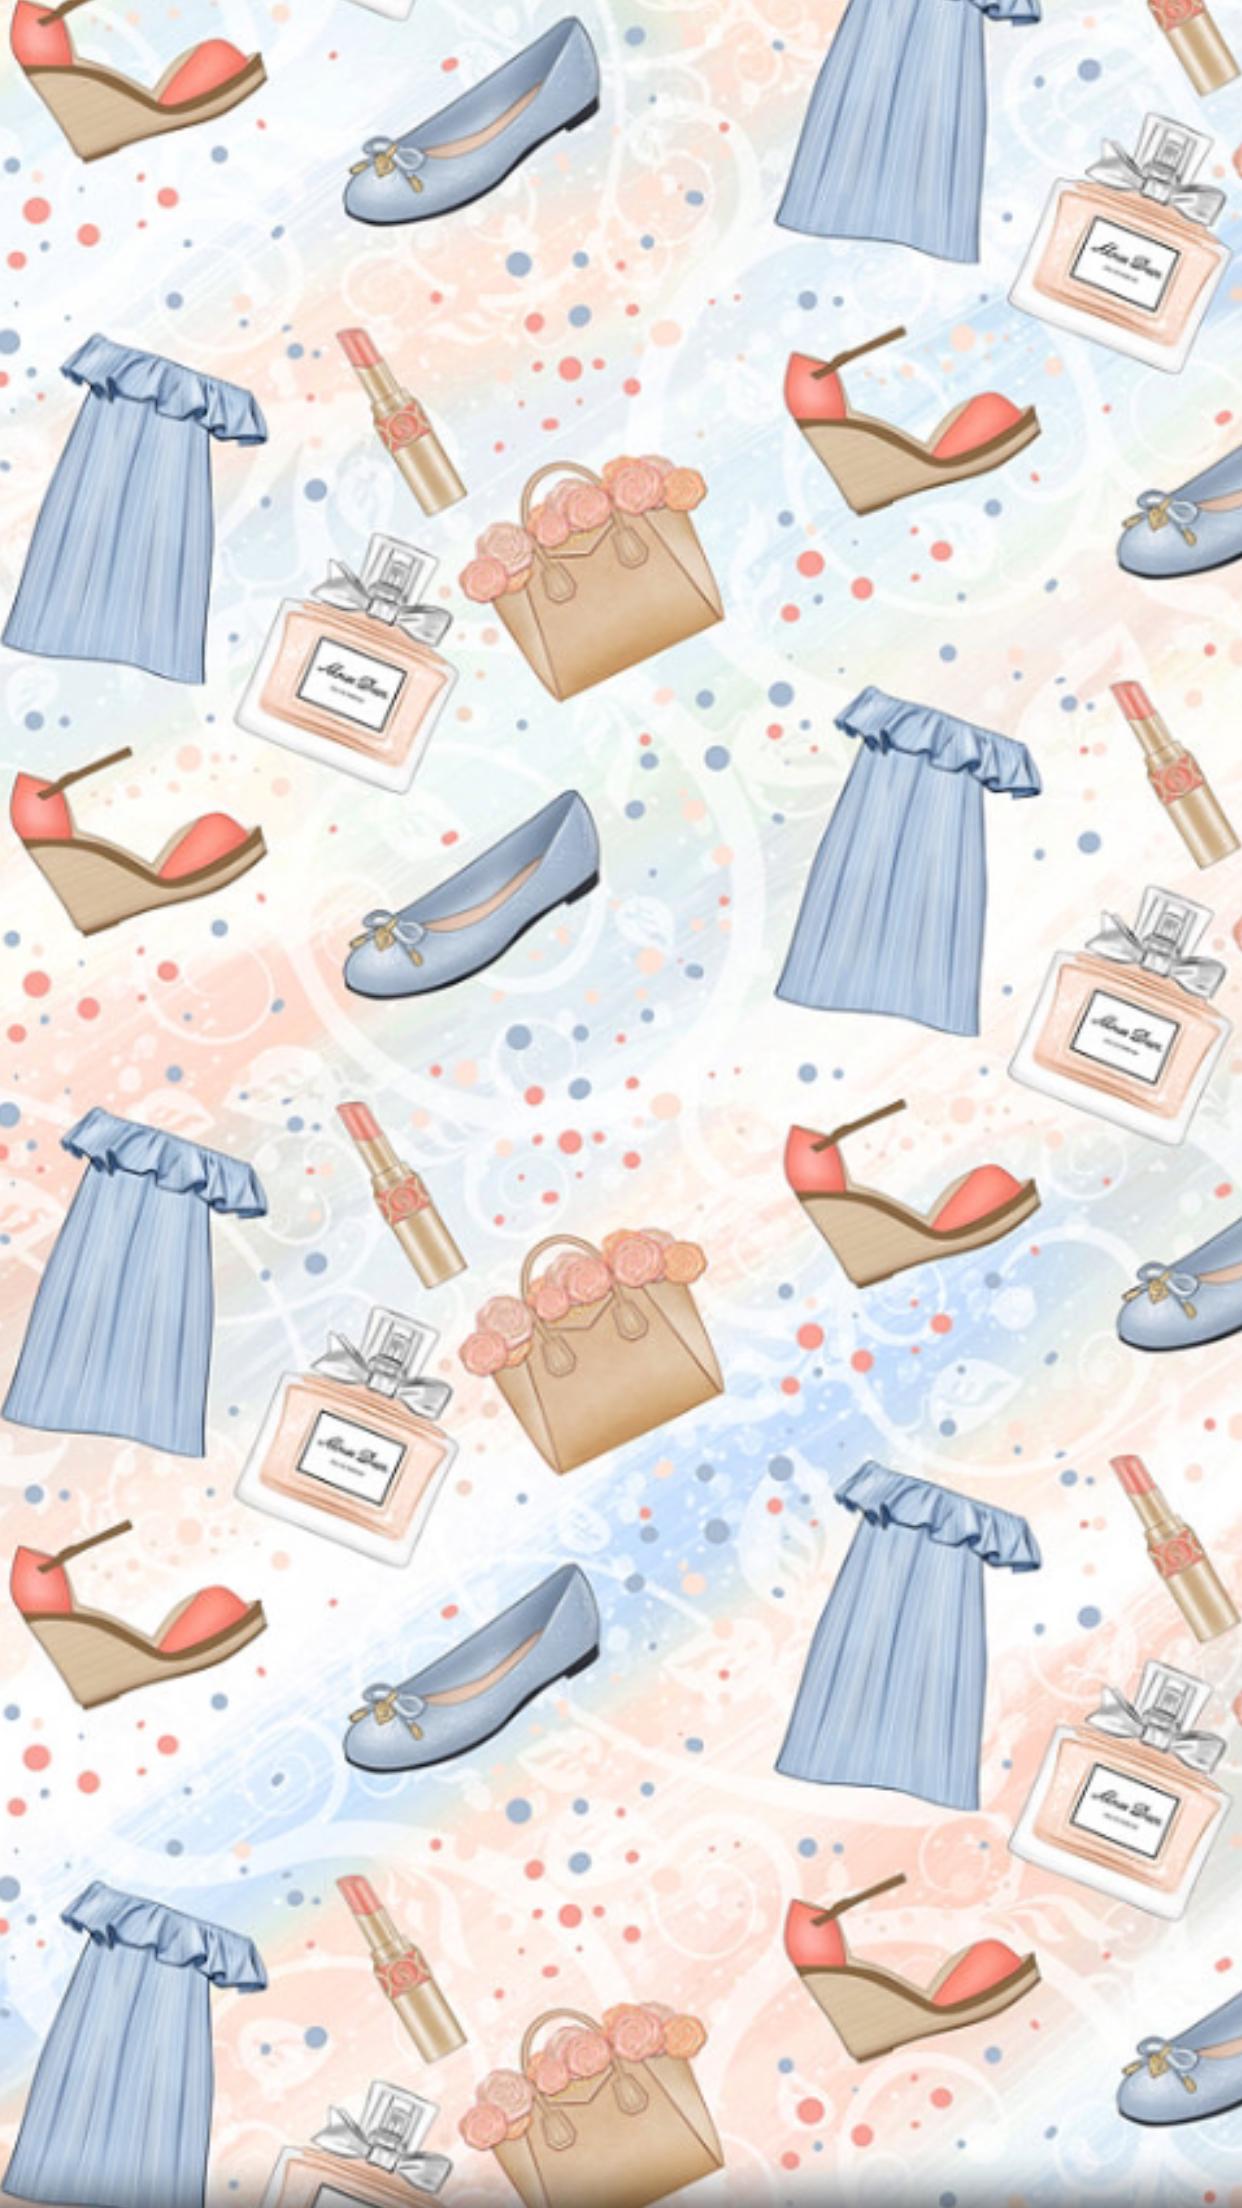 iPhone Wall tjn GlitterFondos Flowery wallpaper